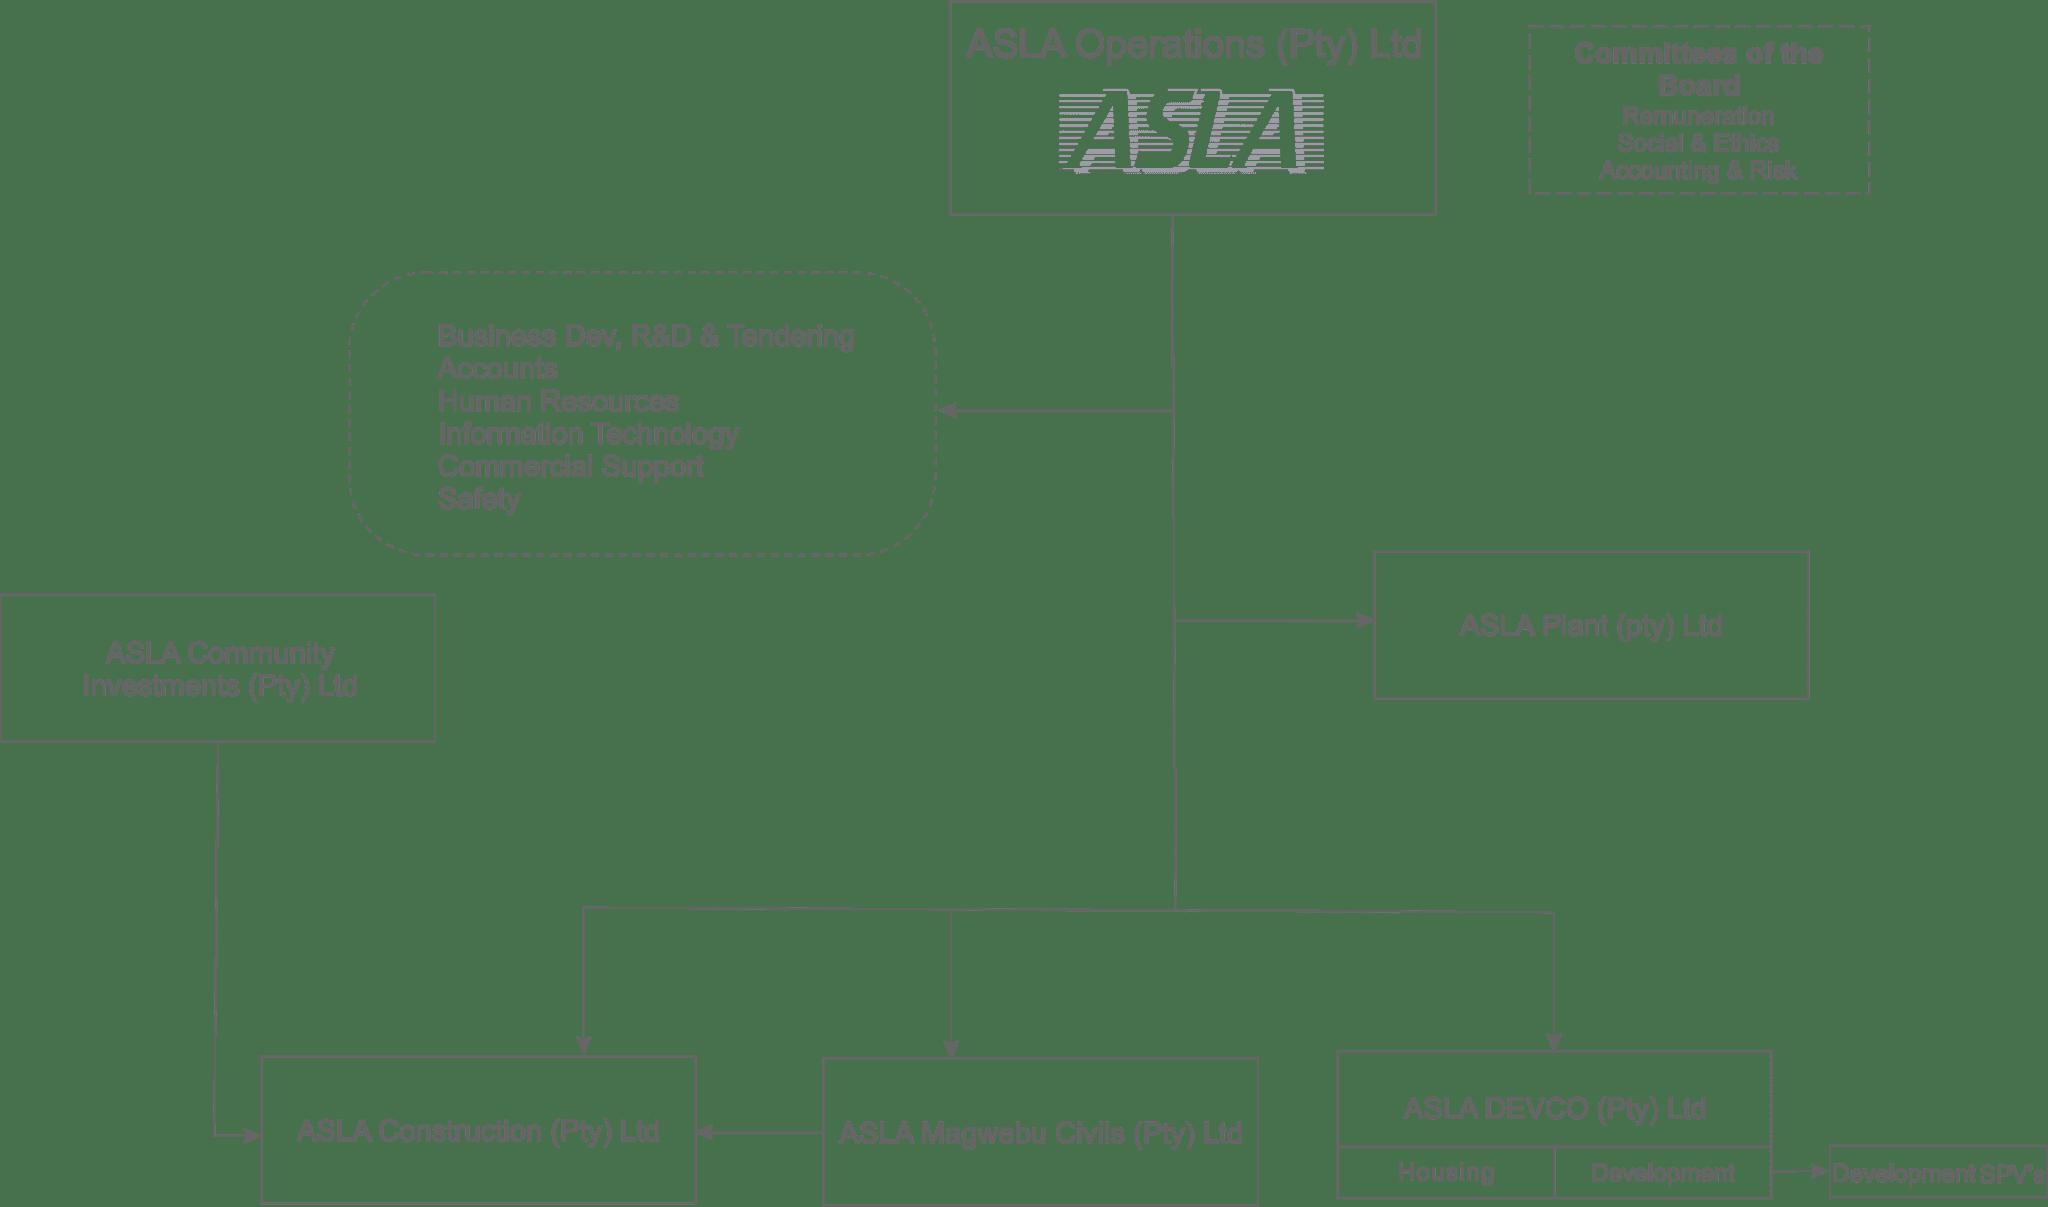 ASLA Organisation Structure